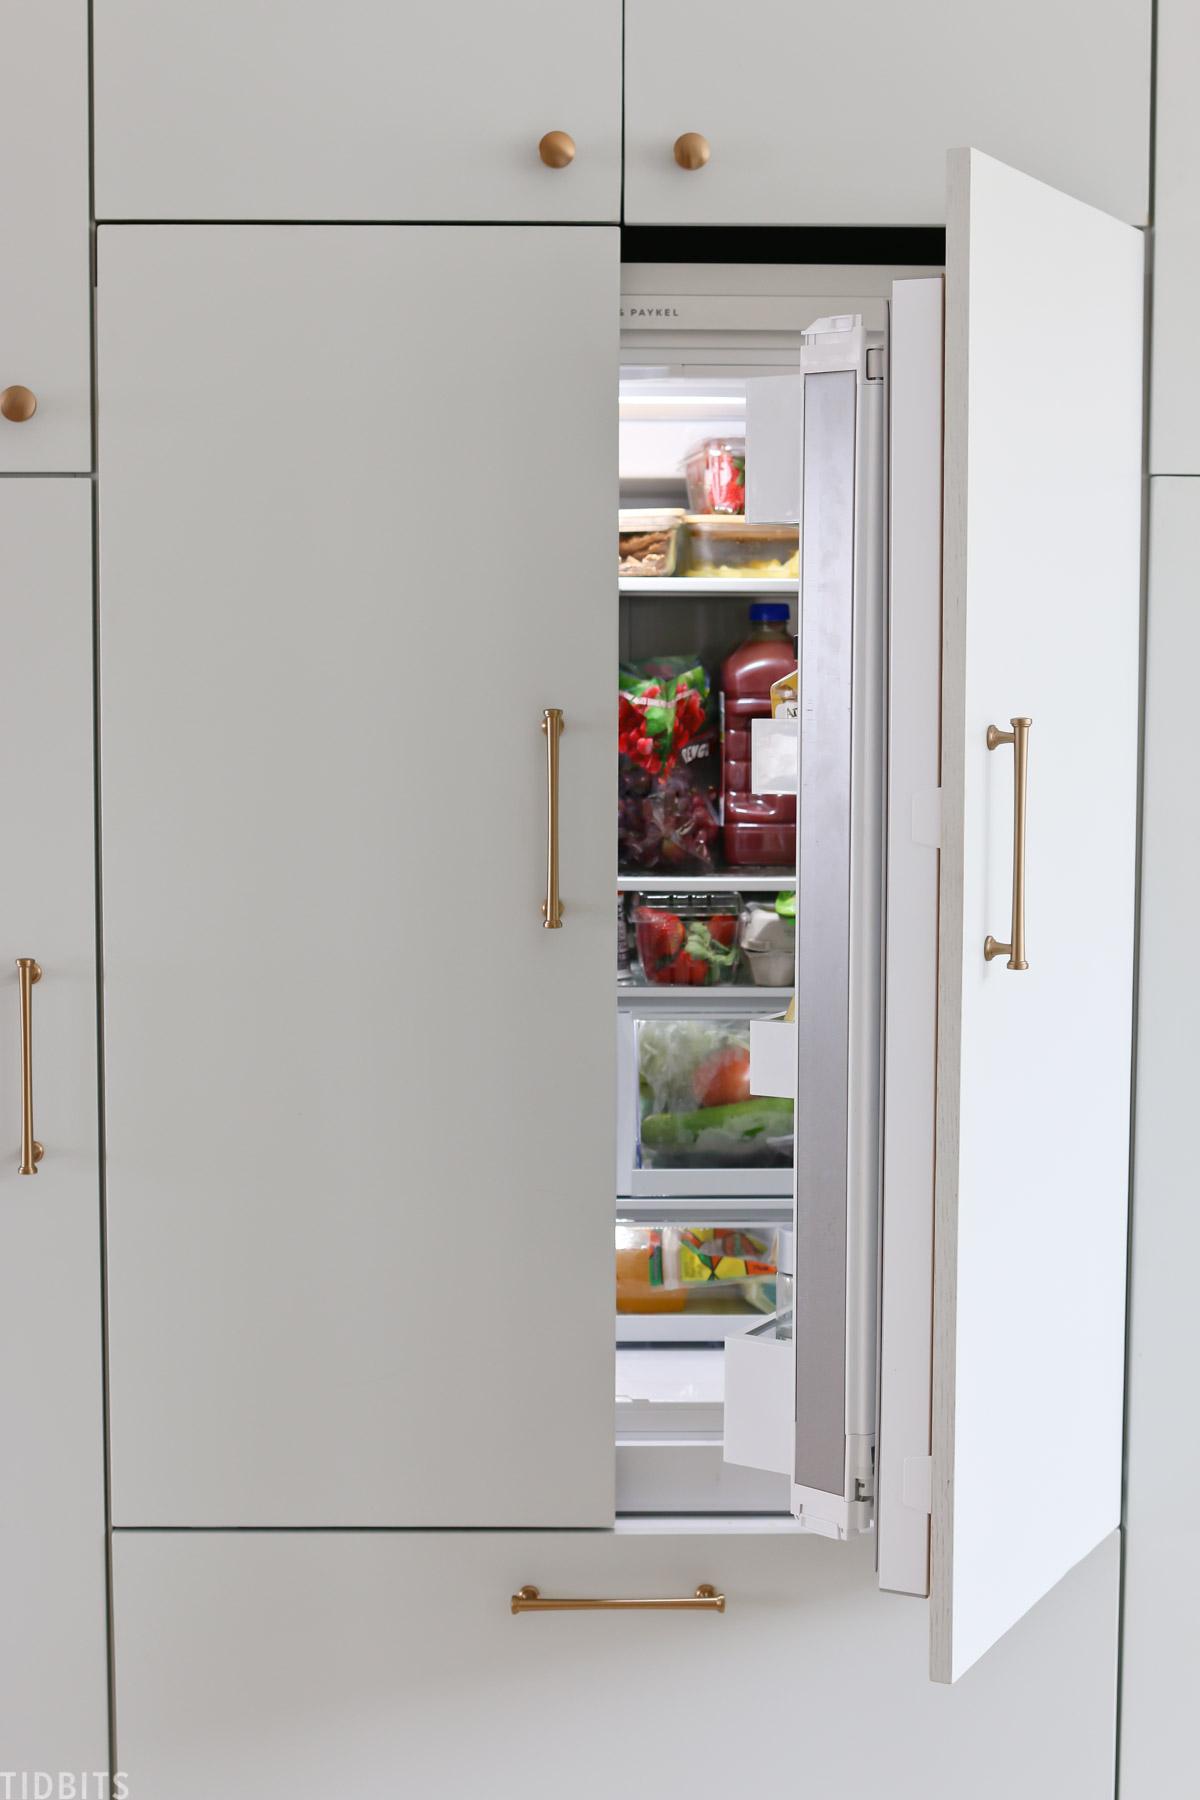 panel ready refrigerator.